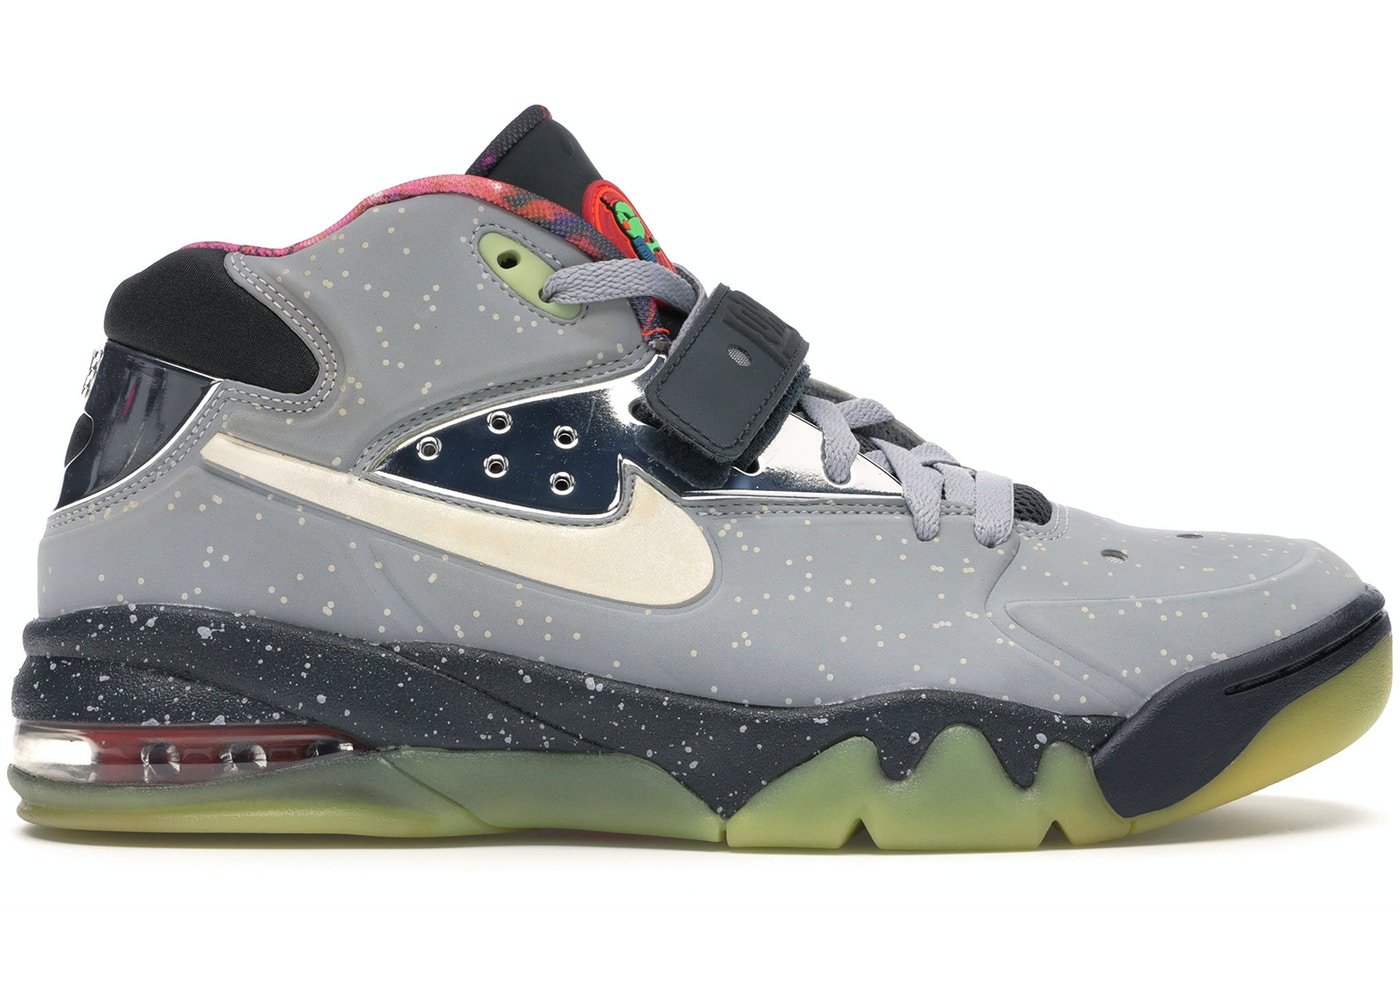 b0b1edb19d98d Nike Air Force Other Shoes - Highest Bid